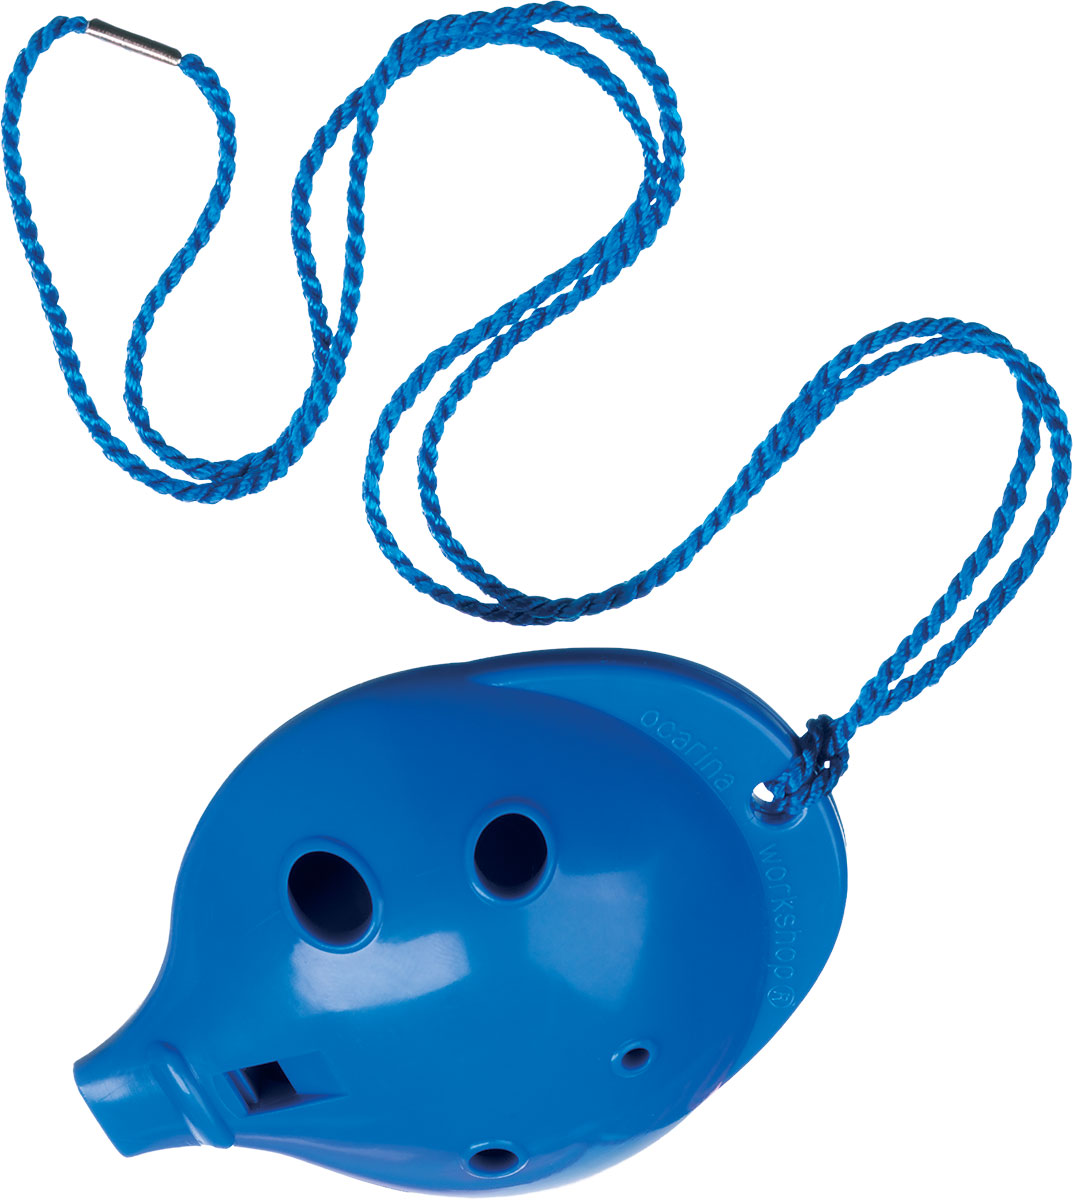 Ocarina Alto 6 Hole Blue in Clam Pack